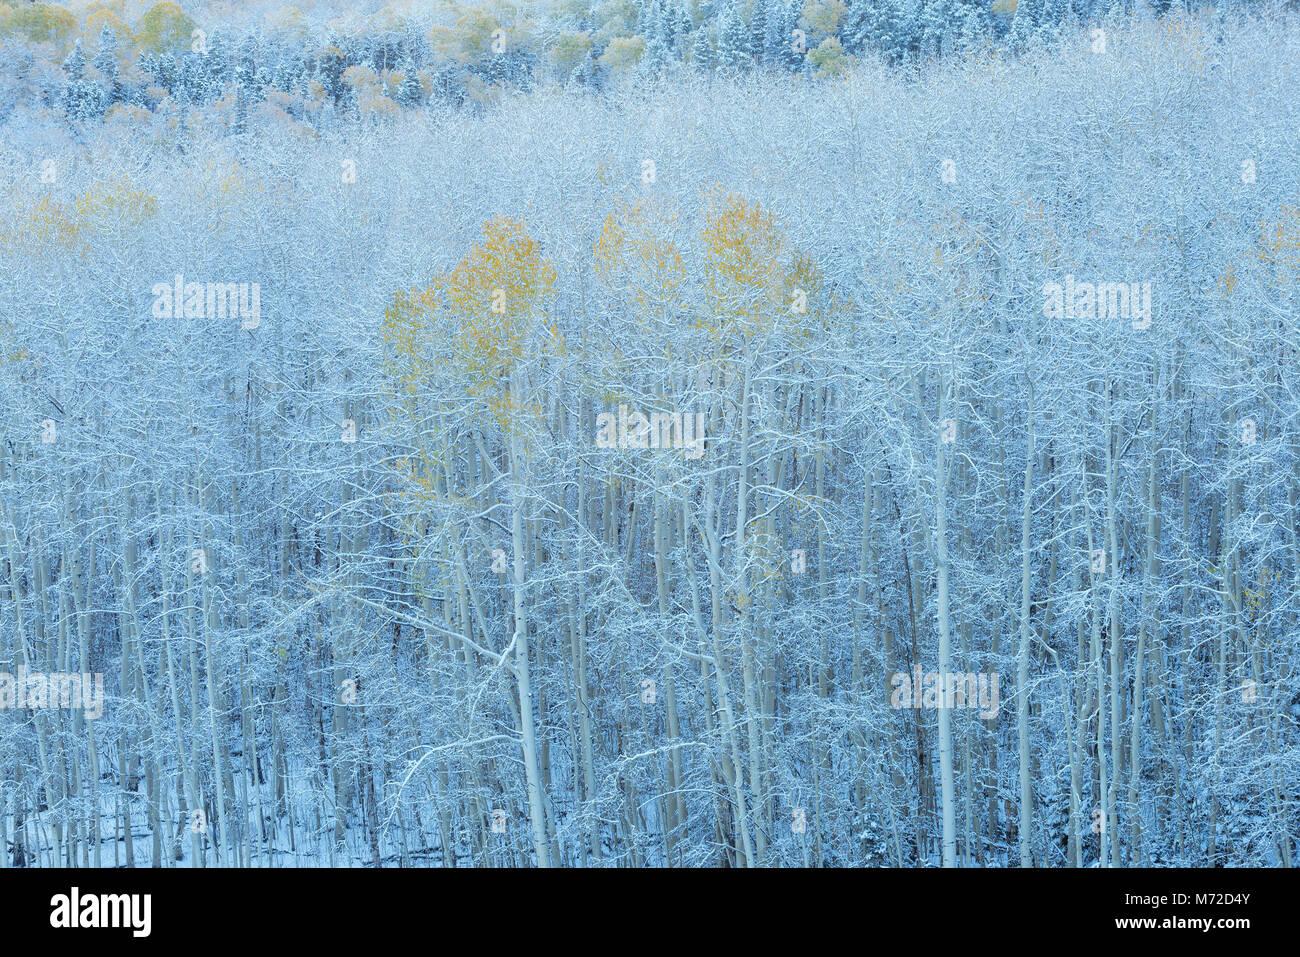 Aspen in Snow, Wilson Mesa, Uncompahgre National Forest, Colorado - Stock Image